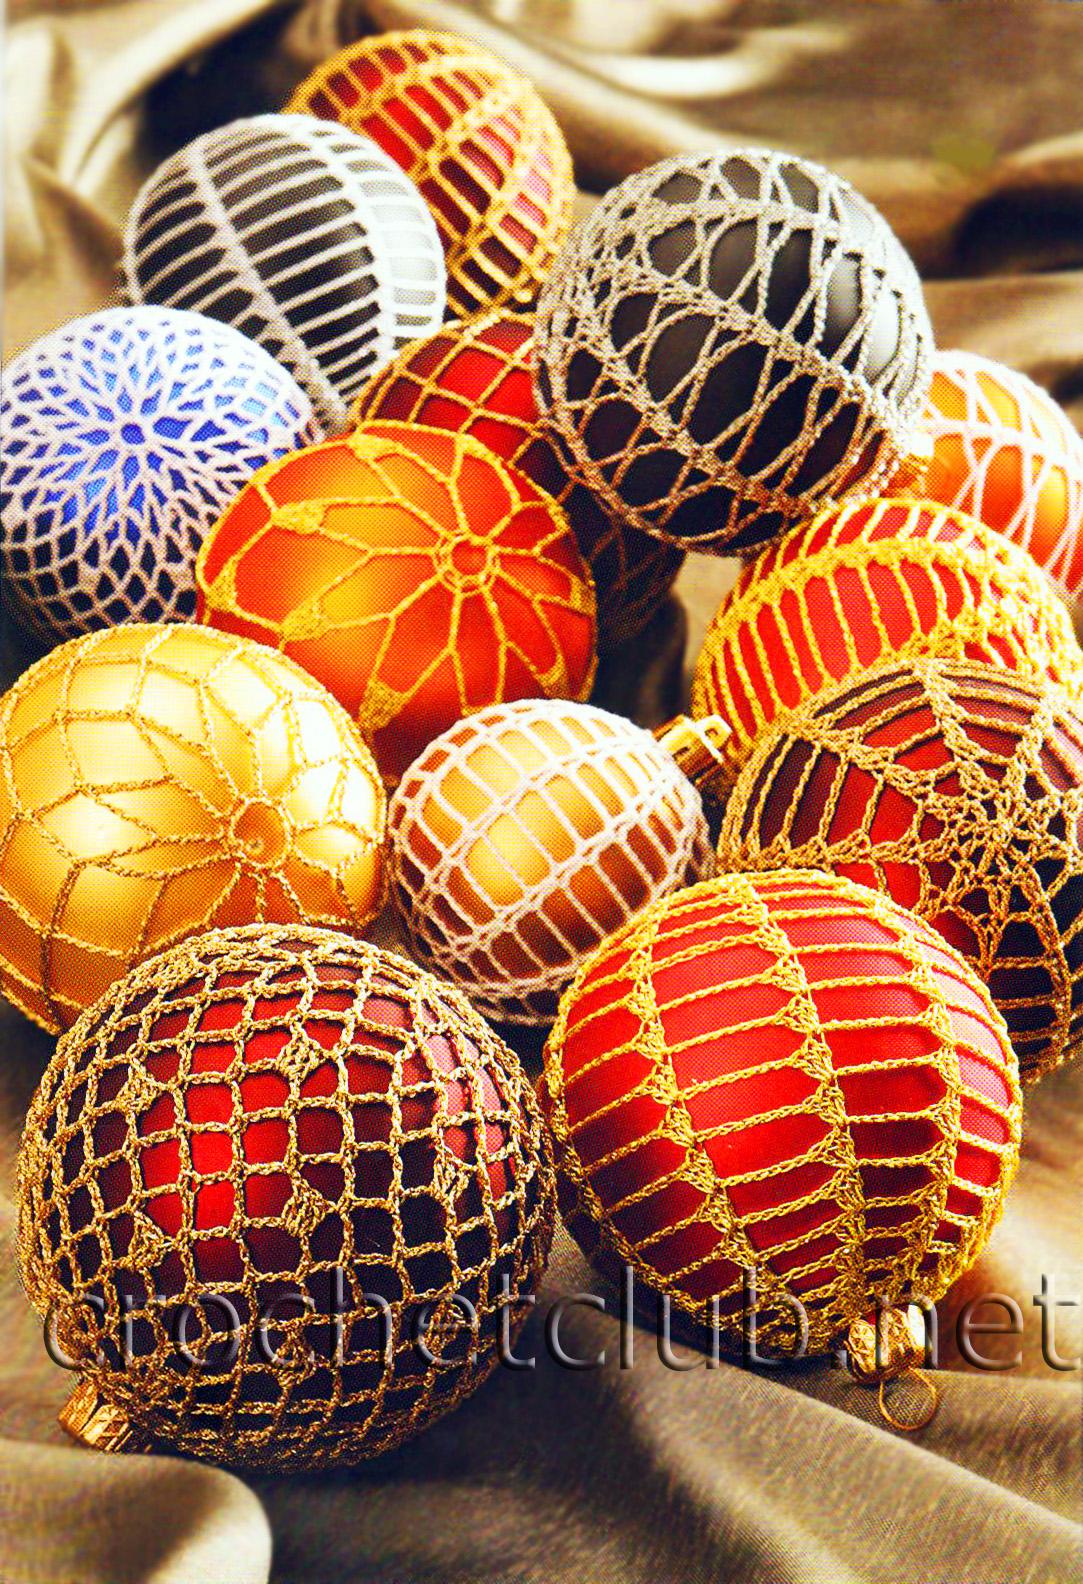 http://crochetclub.net/blog/wp-content/uploads/2009/12/elochnie_shari_1.jpg